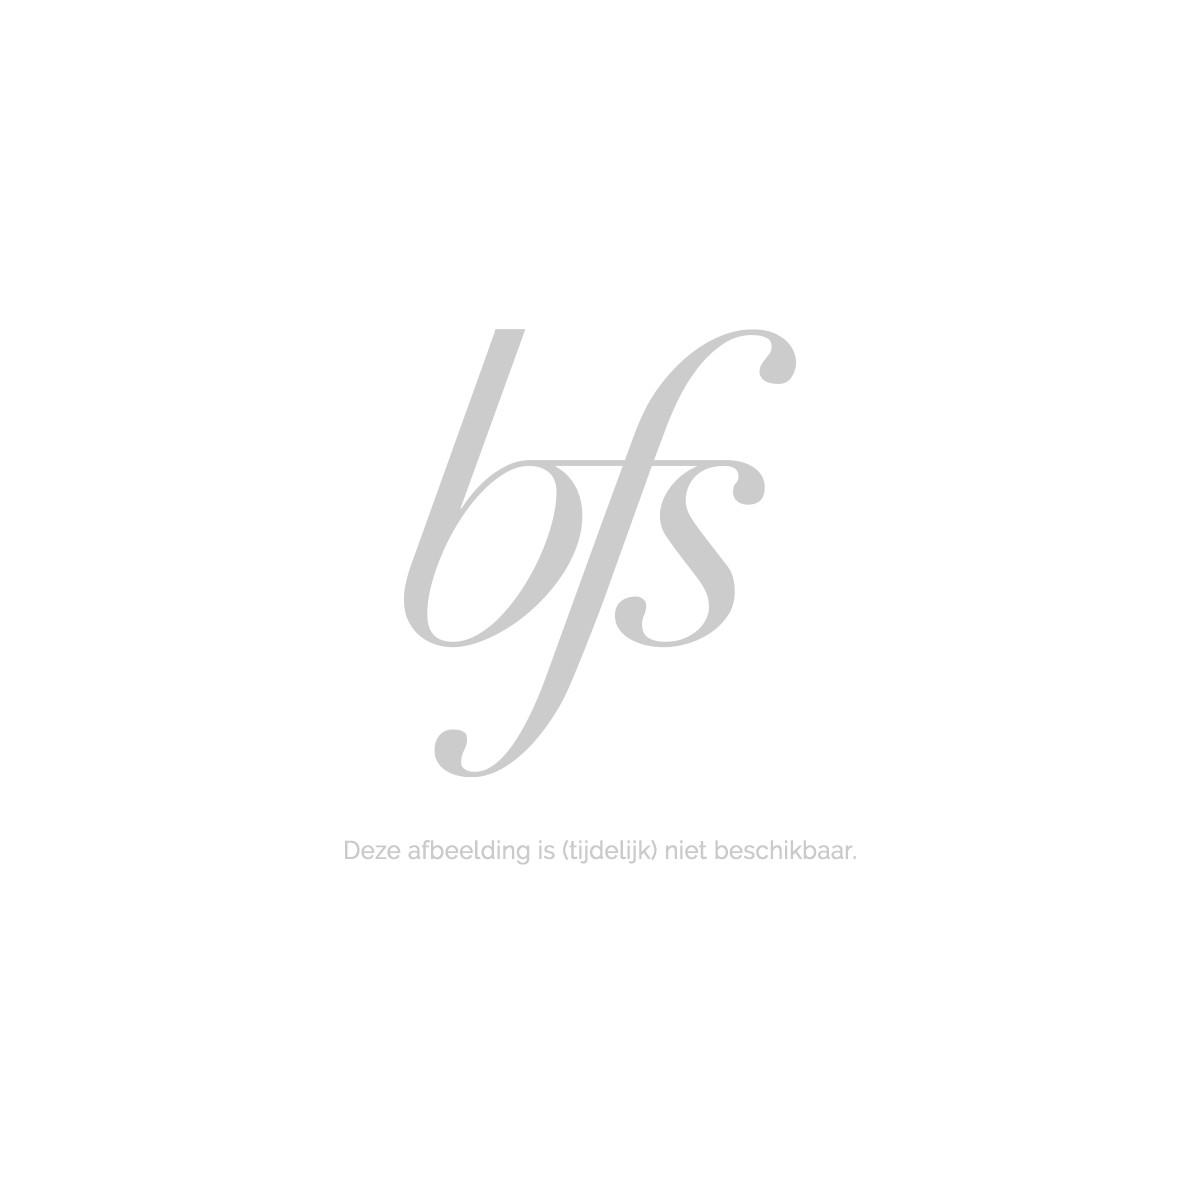 Afbeelding van Casmara Cleanser 3In1 Deep Cleansing 150Ml Cleansers Before any treatment Beauty